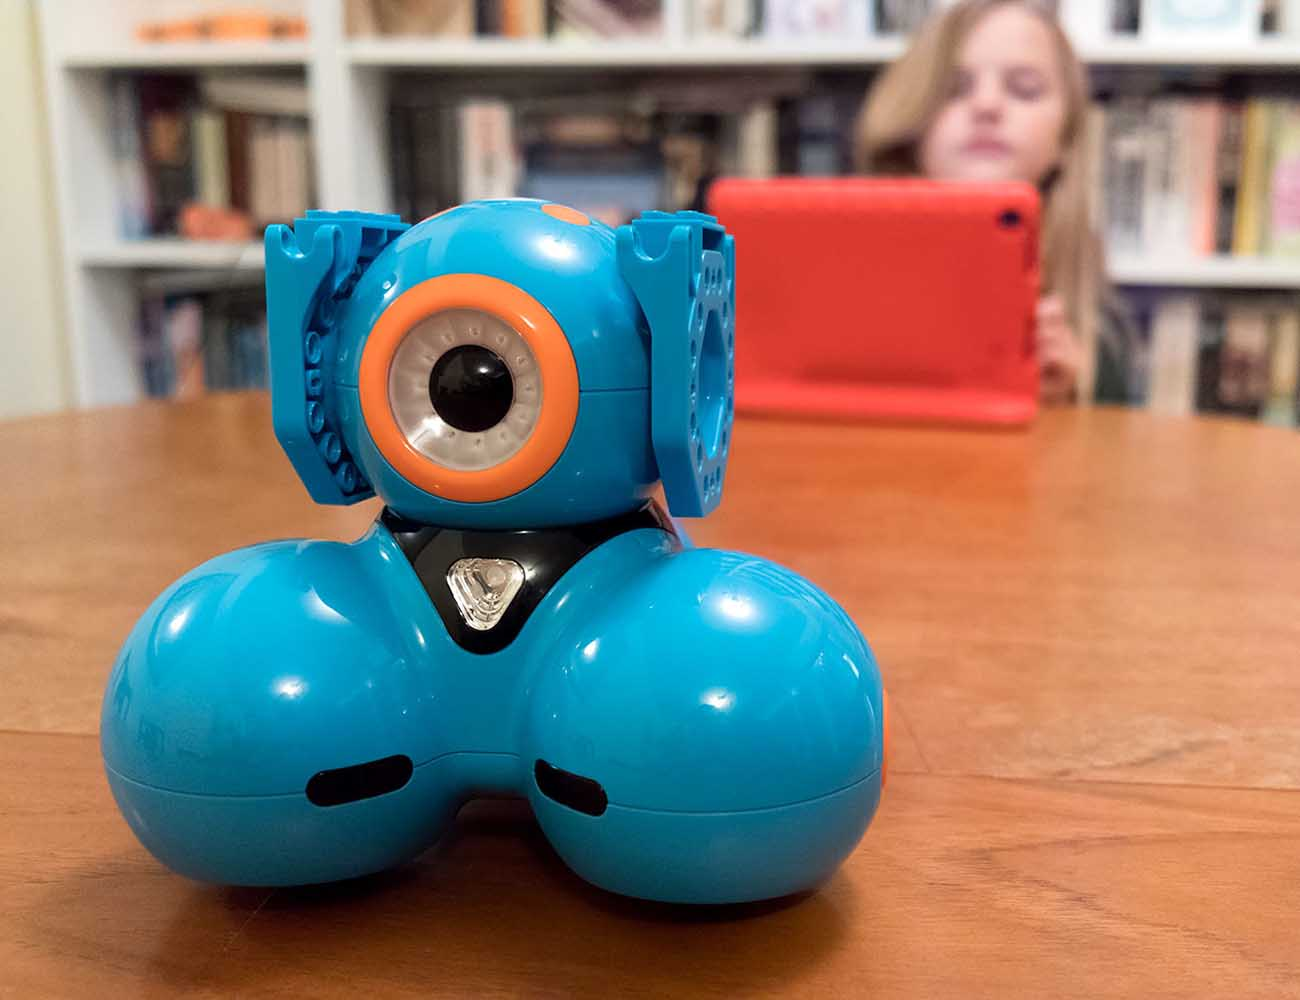 Dot – The Code-Teaching Robot by Wonder Workshop